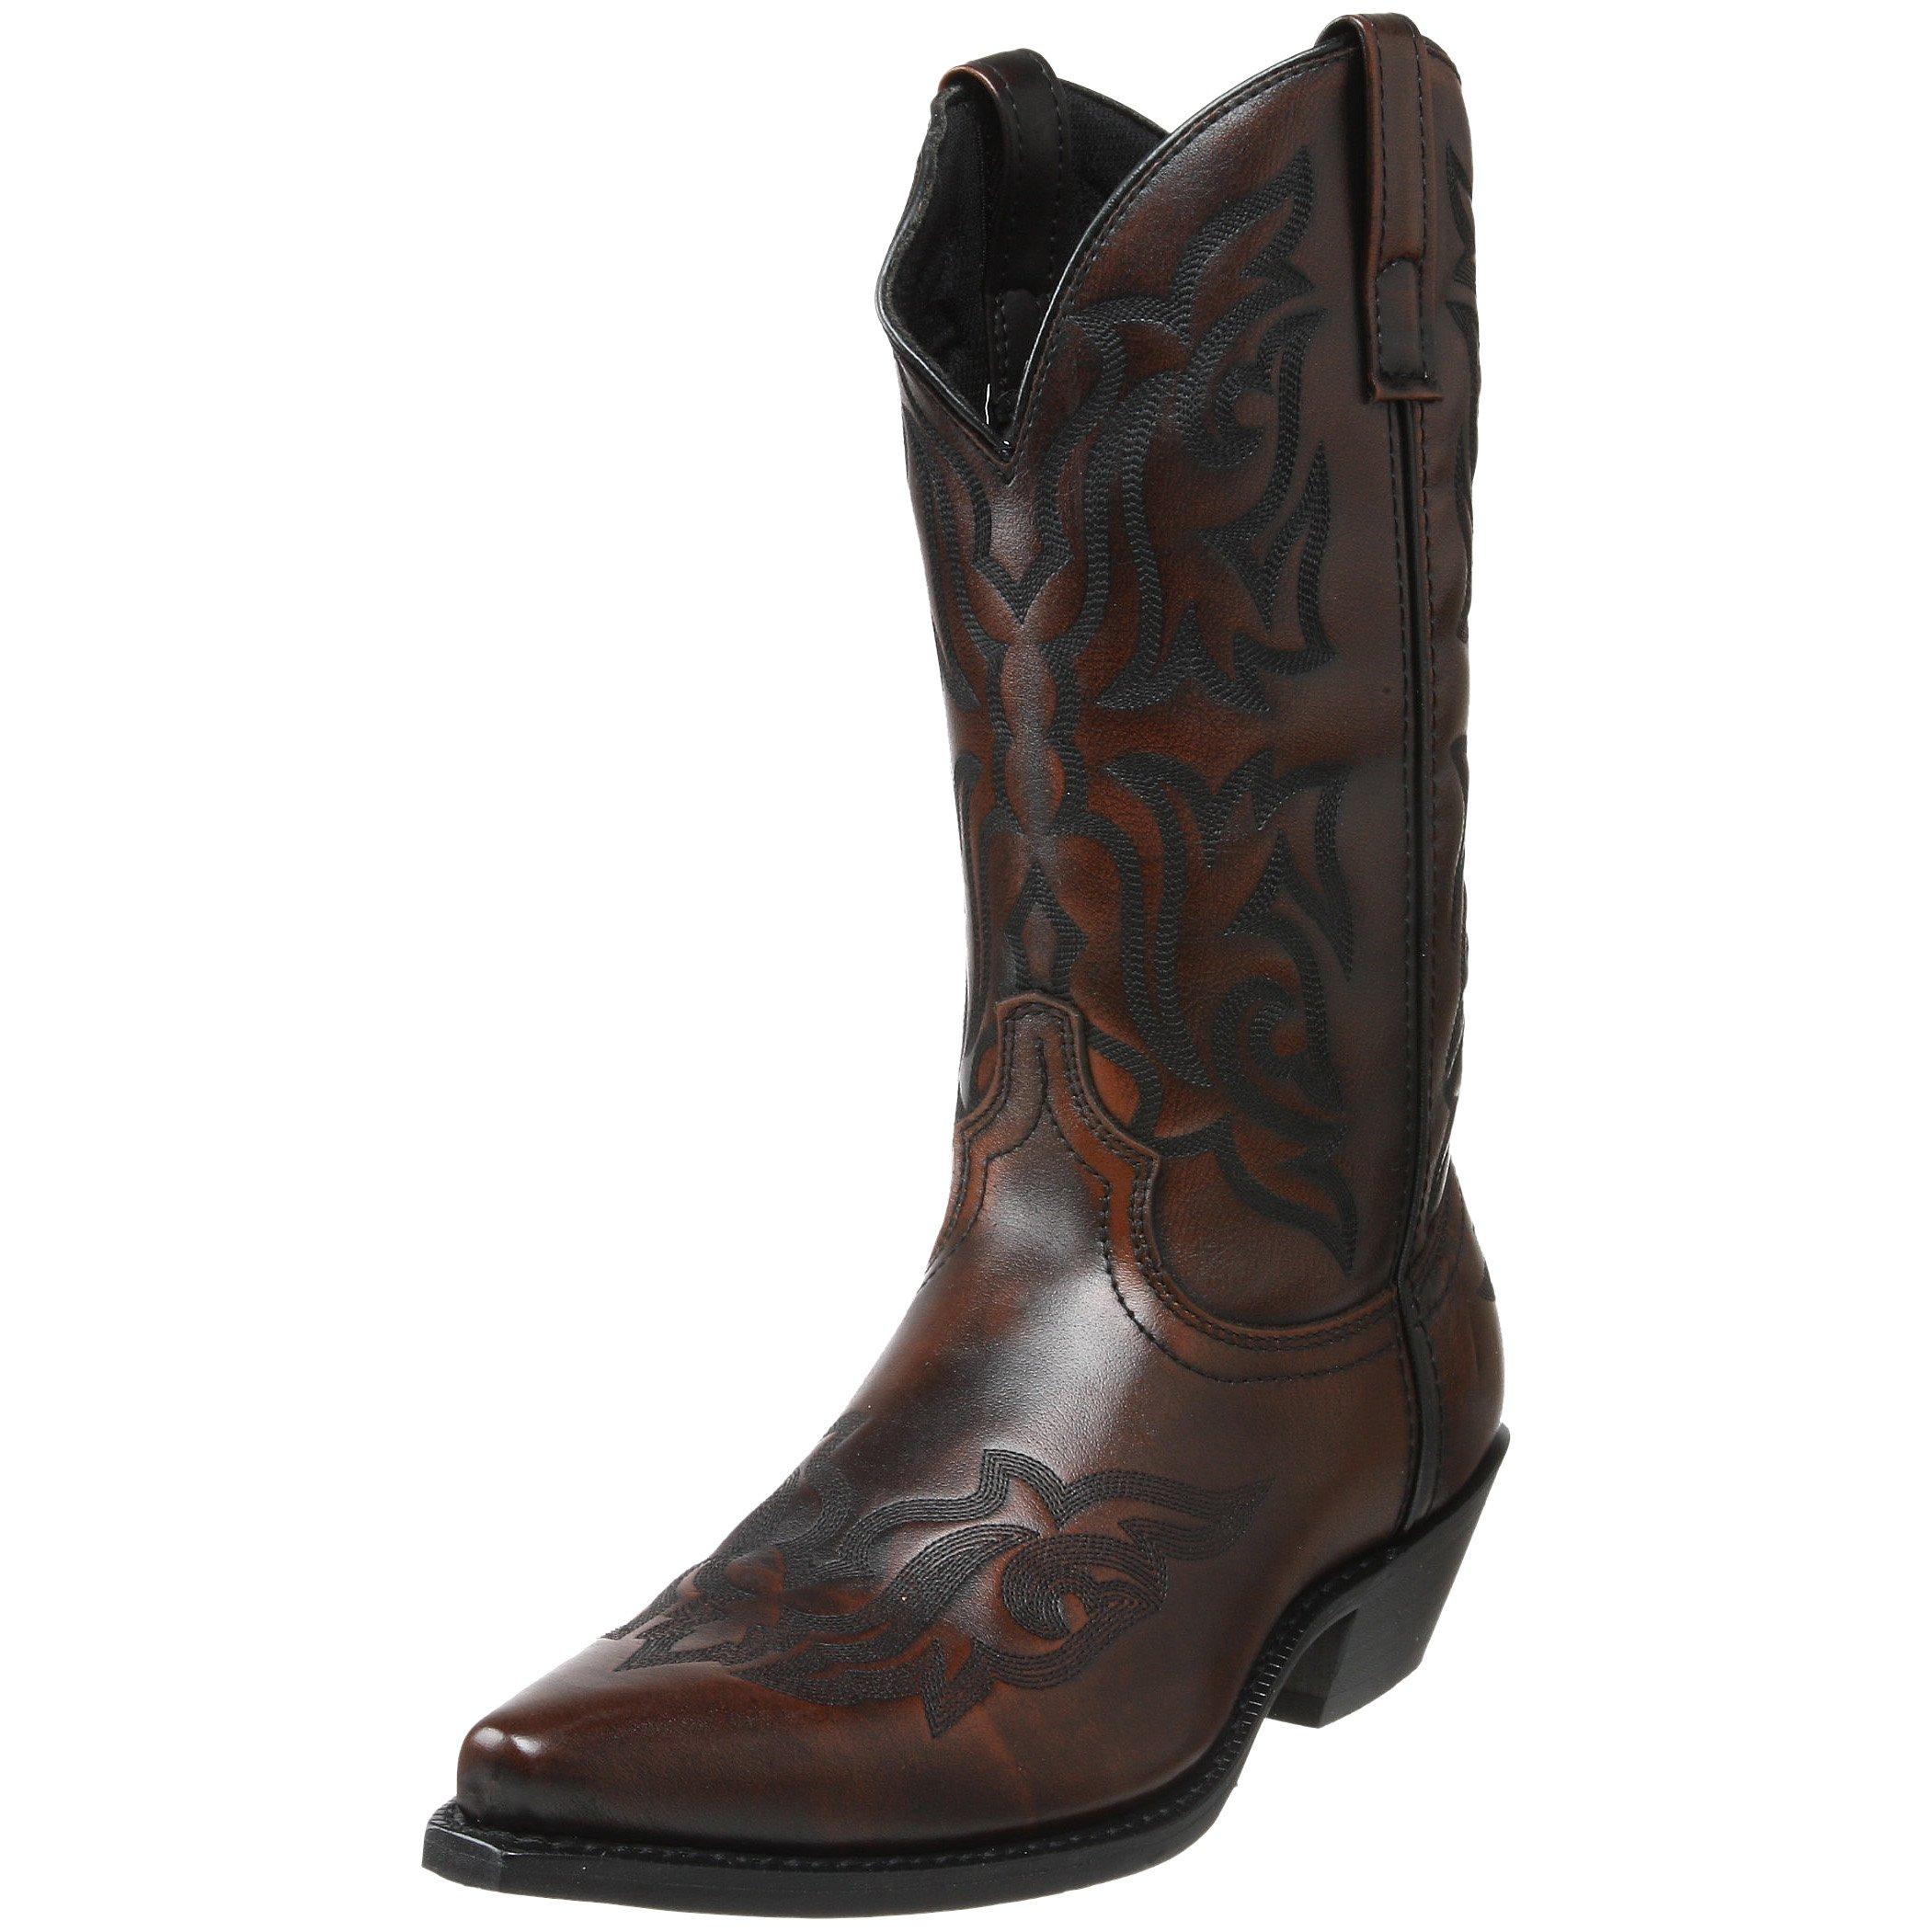 Laredo Men's Hawk Western Boot,Brown/Gold,11 D US